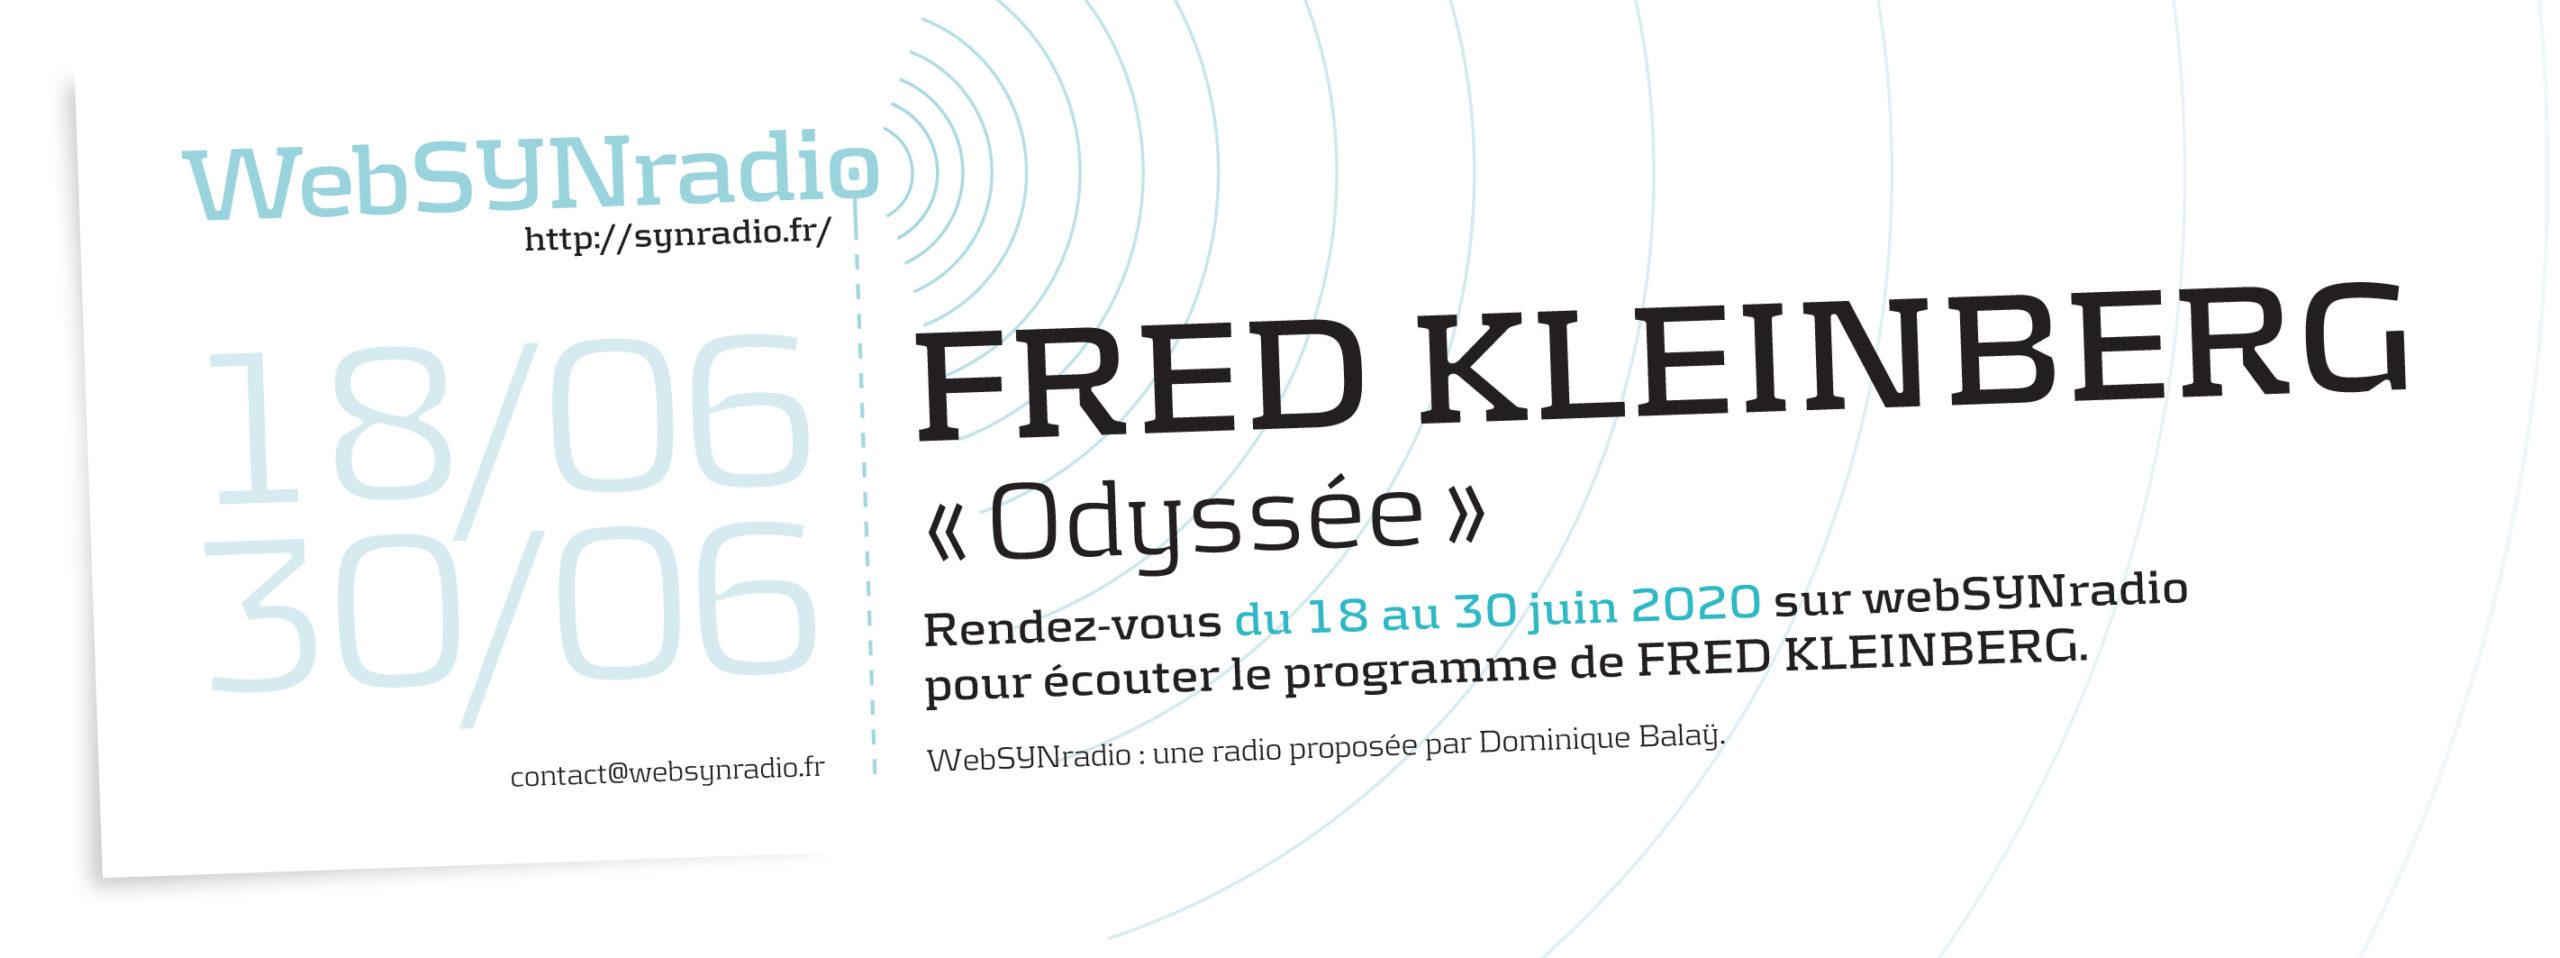 http://synradio.fr/fred-kleinberg/